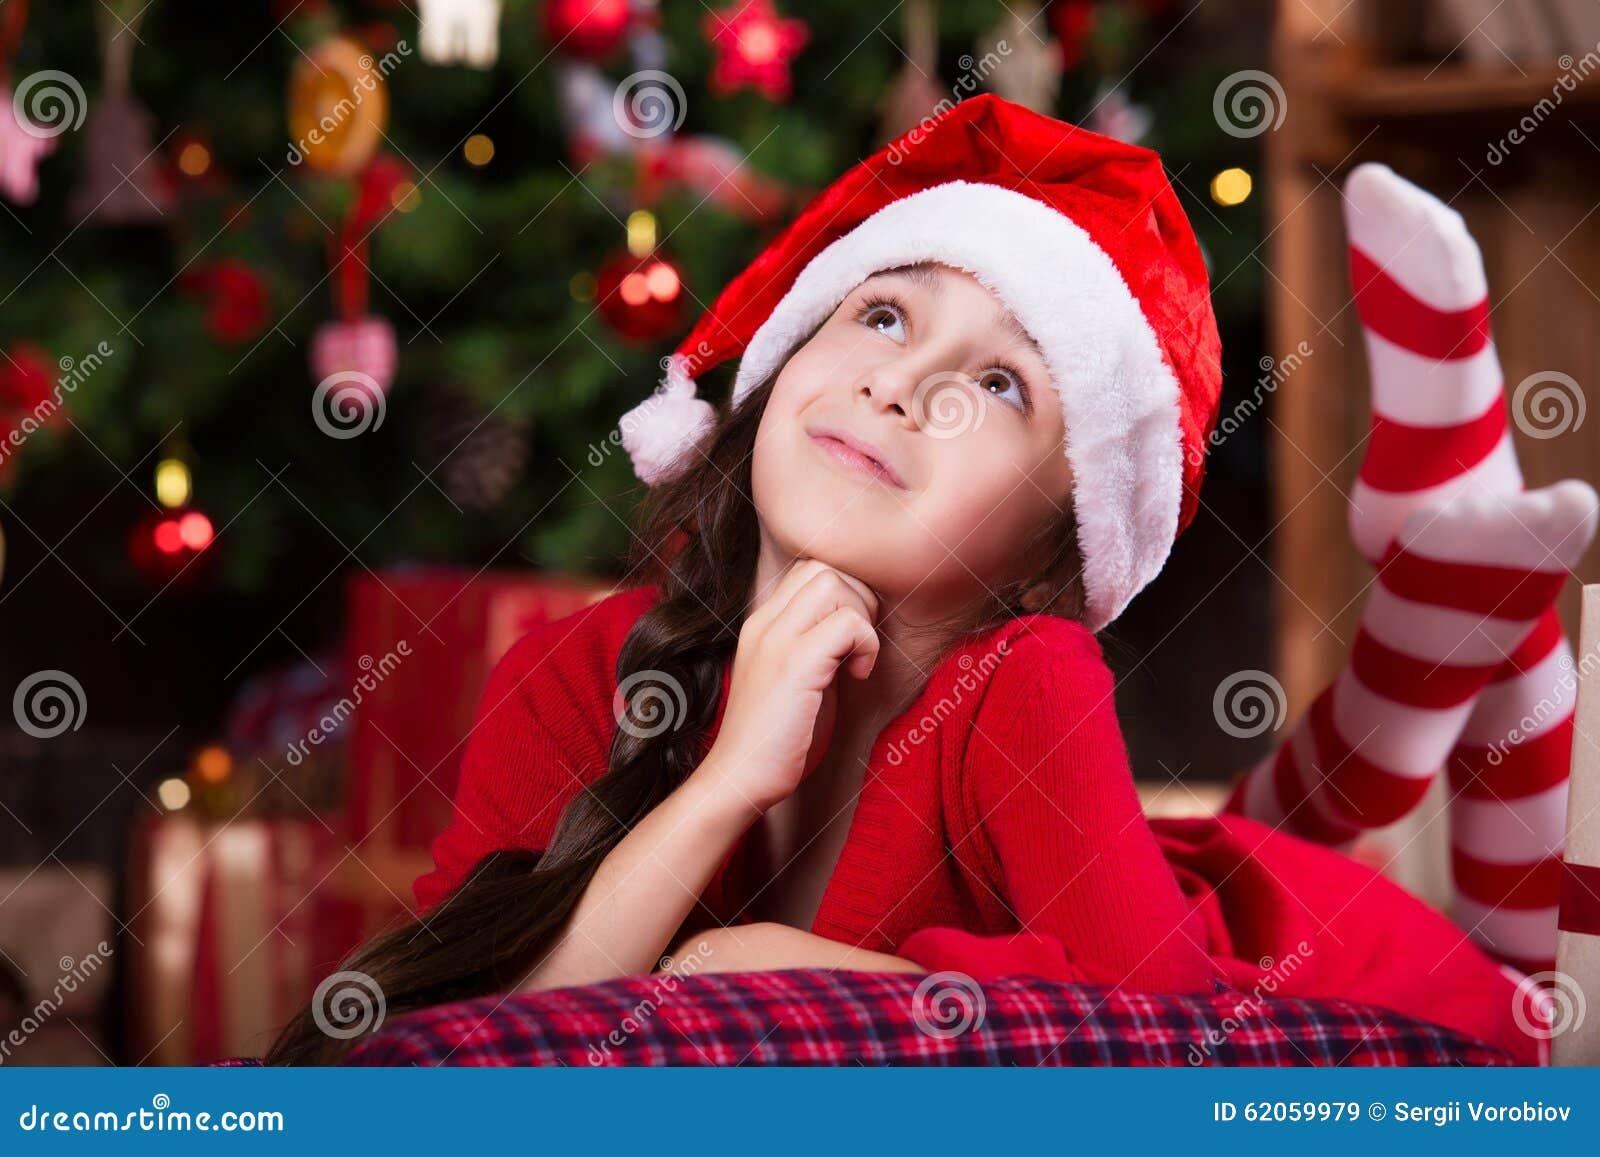 3a0da129415c8 Cute Little Girl In Santa Hat Dreaming Near The Stock Image - Image ...